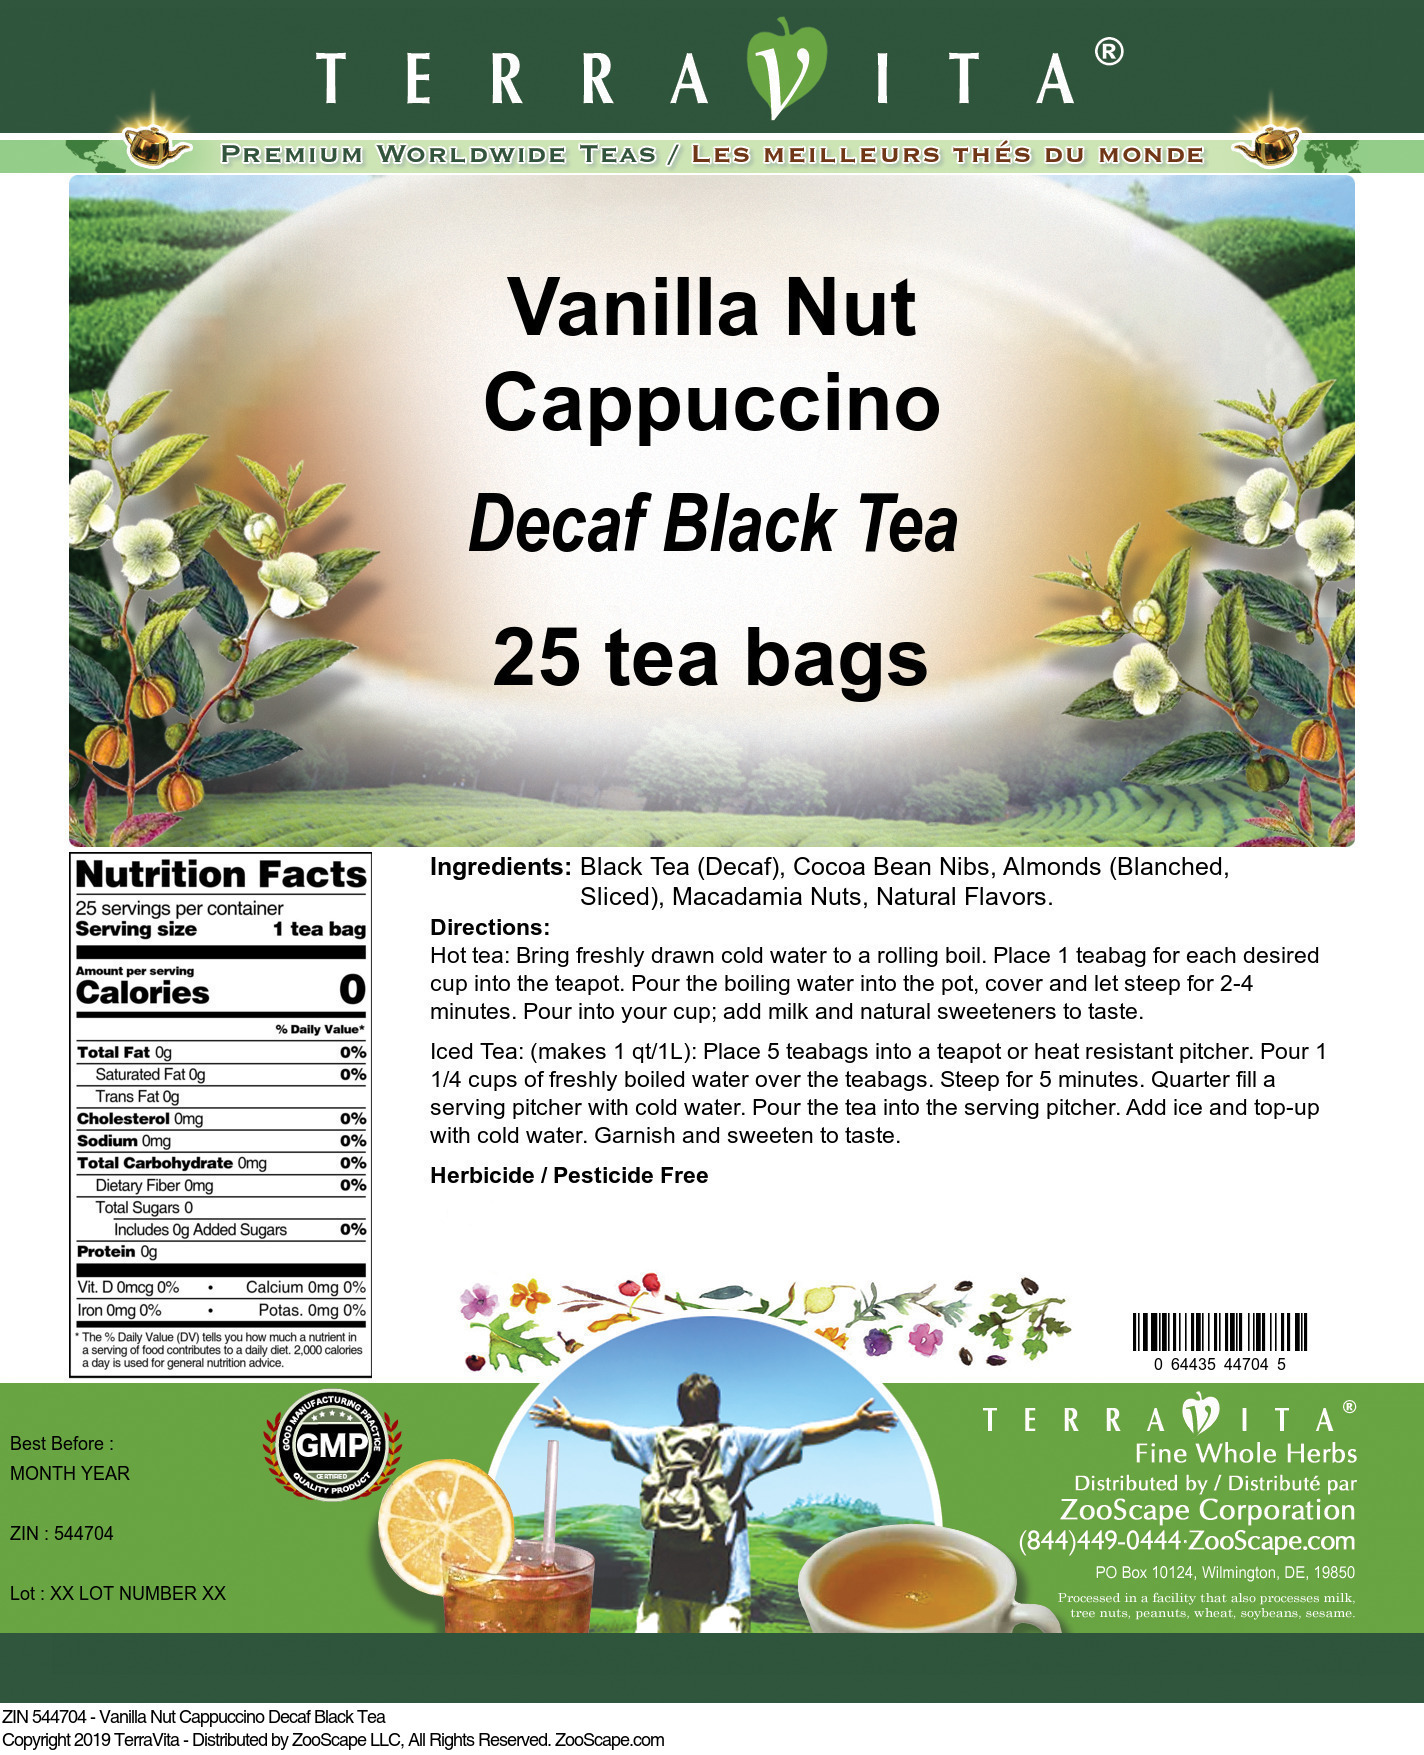 Vanilla Nut Cappuccino Decaf Black Tea